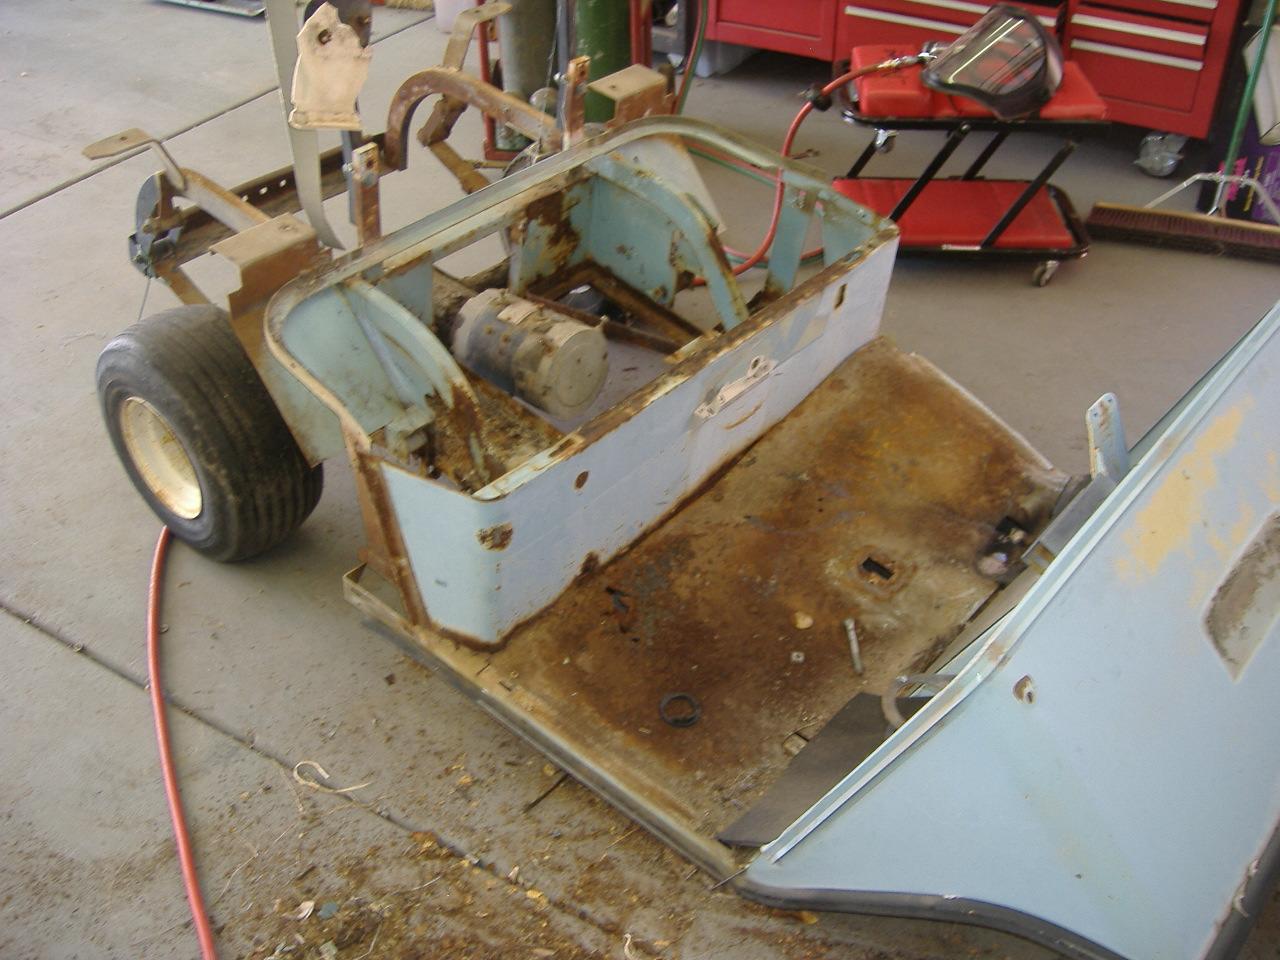 hight resolution of ev midget build part 4 rear suspension needthatcar golf cart light wiring diagram golf cart motor wiring diagram